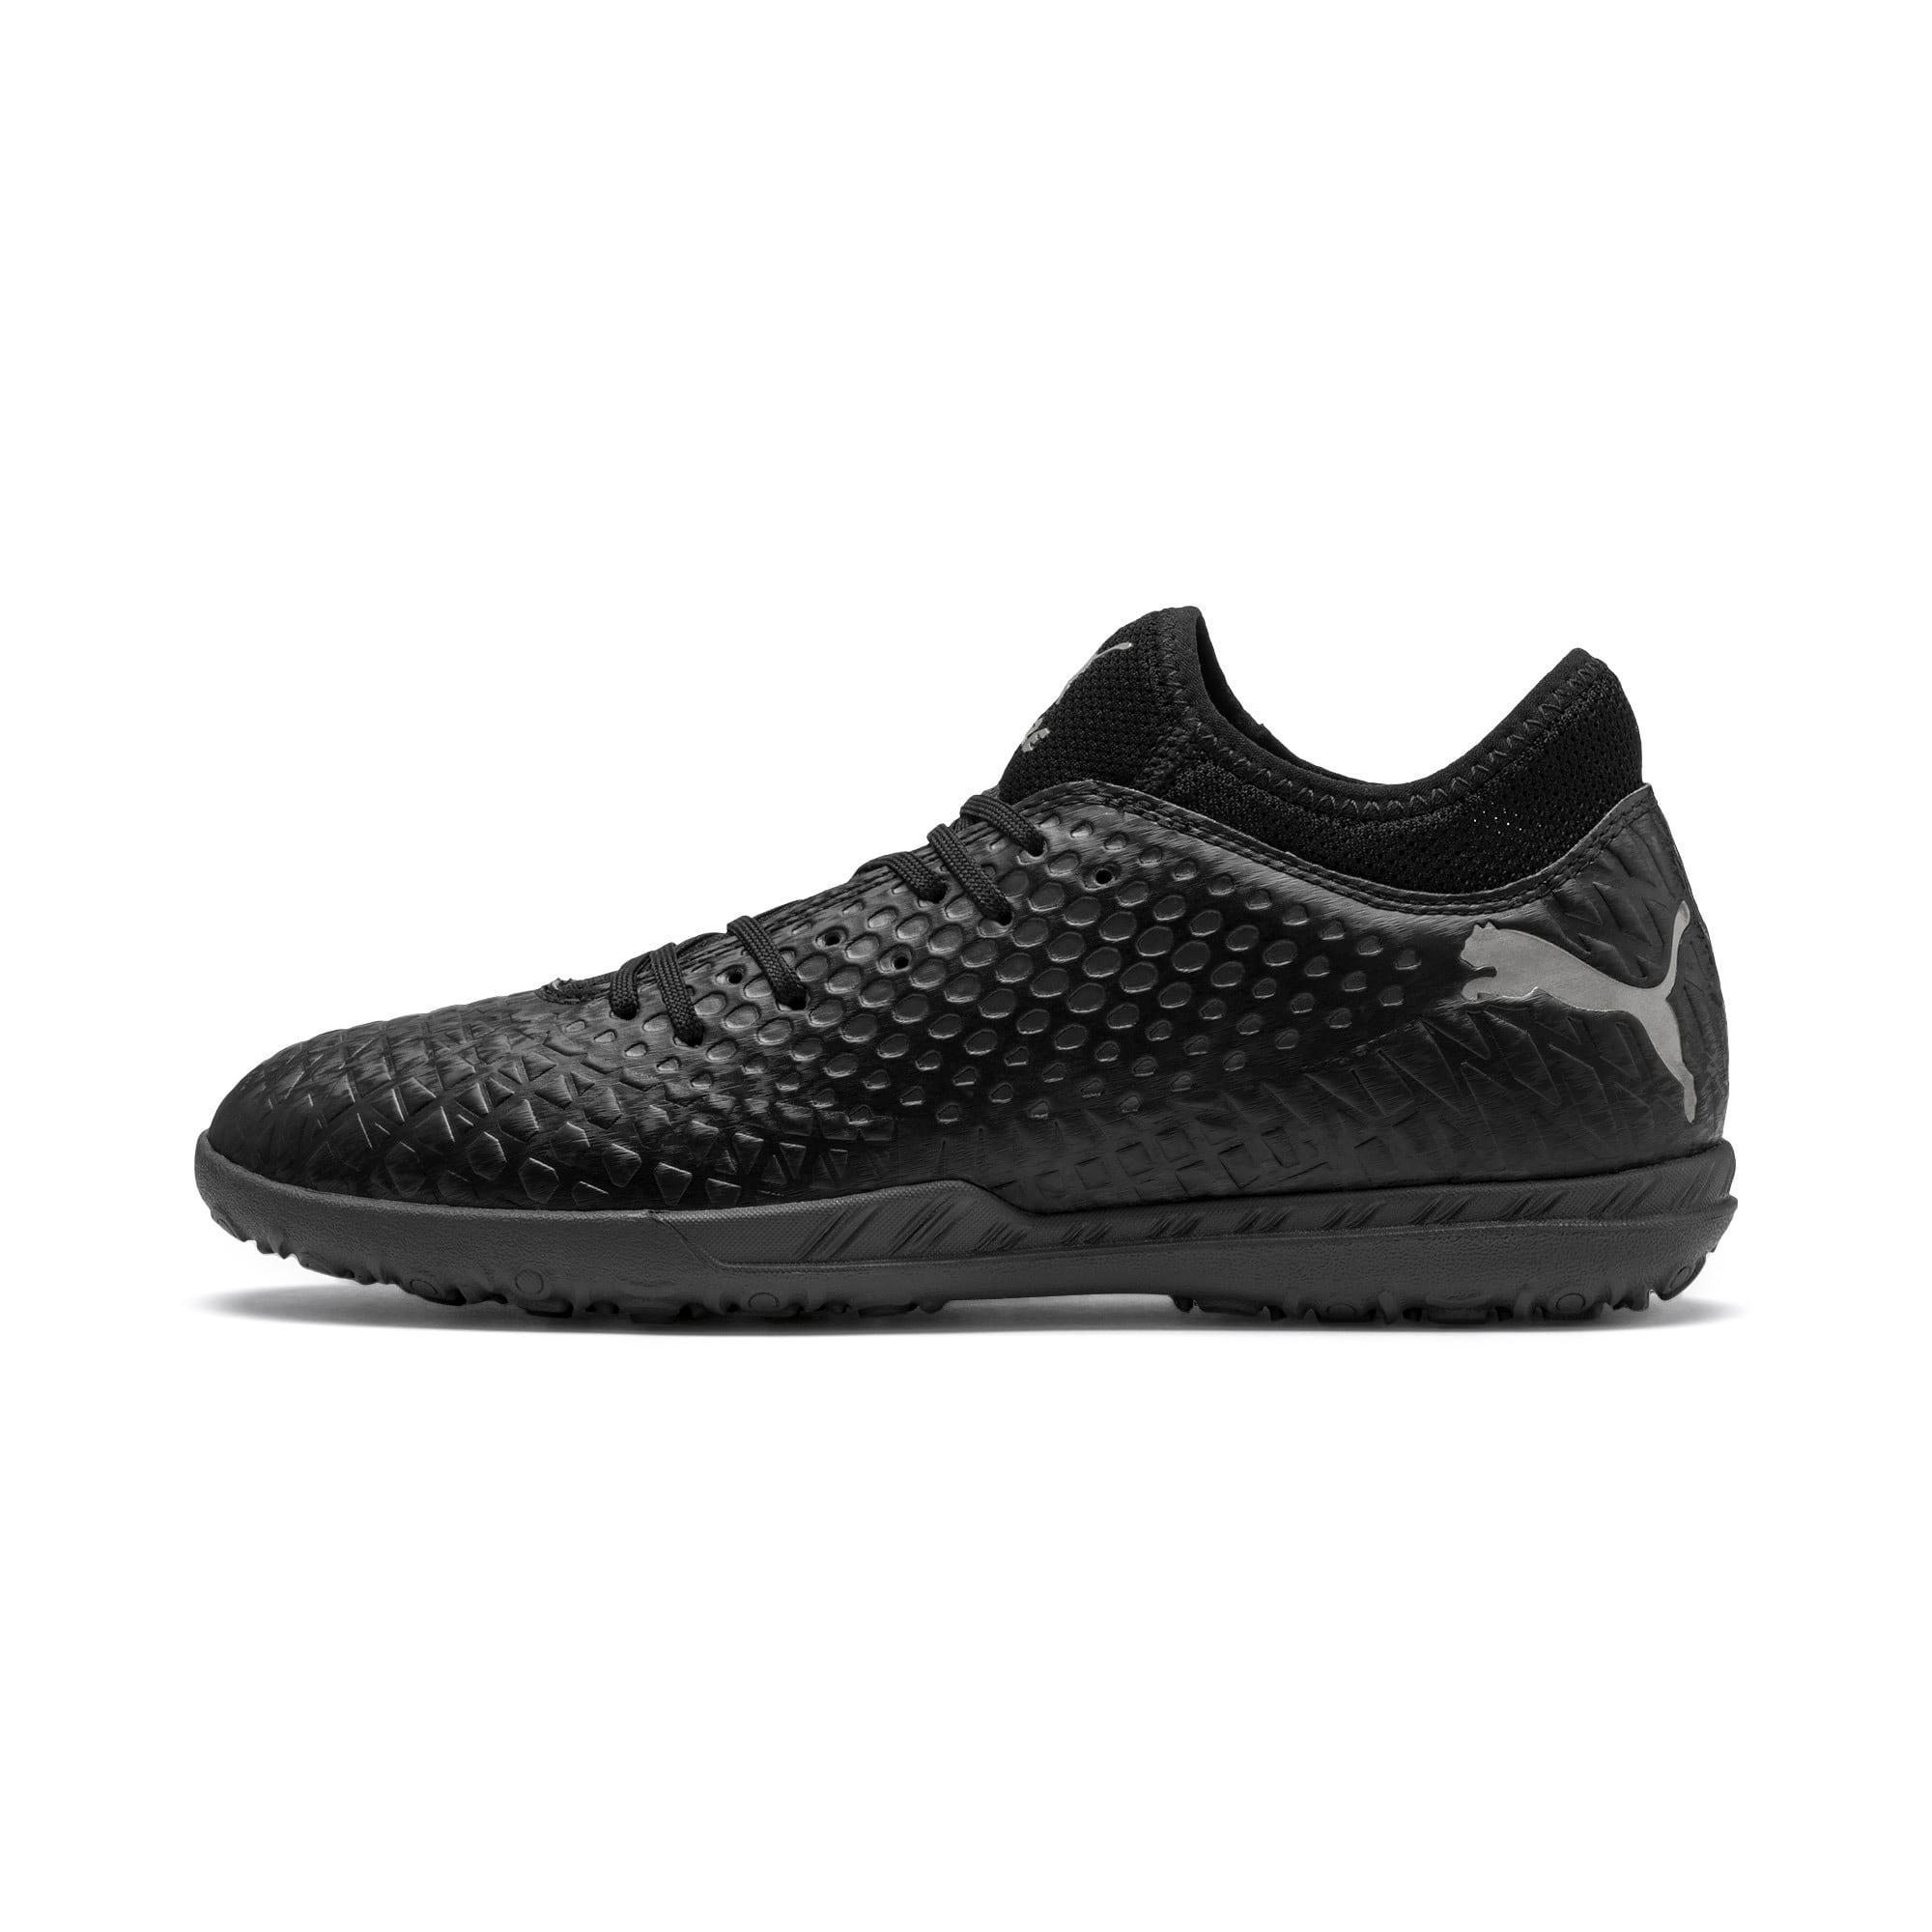 Thumbnail 1 of FUTURE 4.4 TT Men's Soccer Shoes, Black-Black-Puma Aged Silver, medium